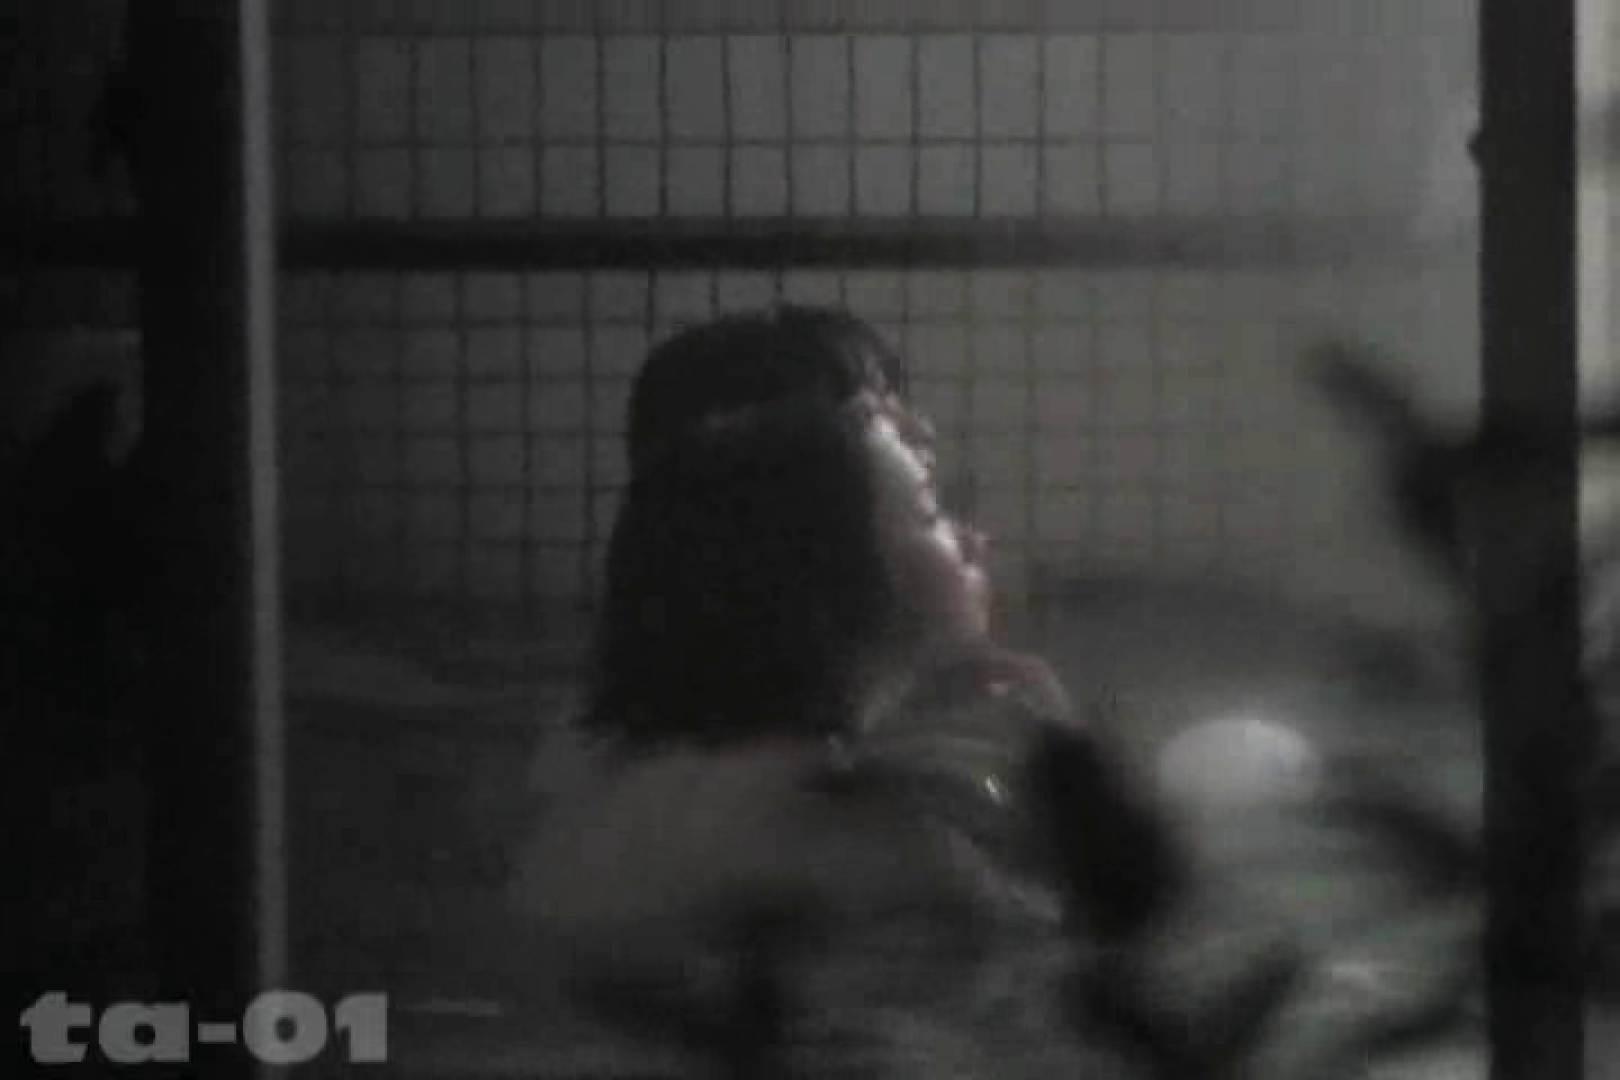 合宿ホテル女風呂盗撮高画質版 Vol.01 盗撮・必見 濡れ場動画紹介 106画像 37